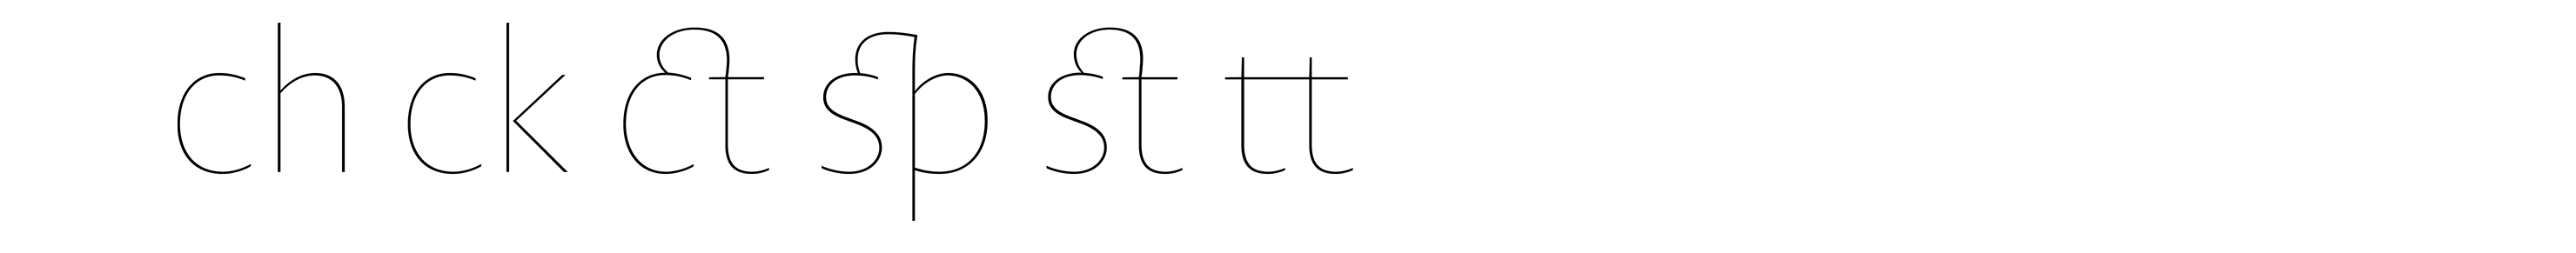 Typeface-Novel-Sans-Hairline-F05-Atlas-Font-Foundry